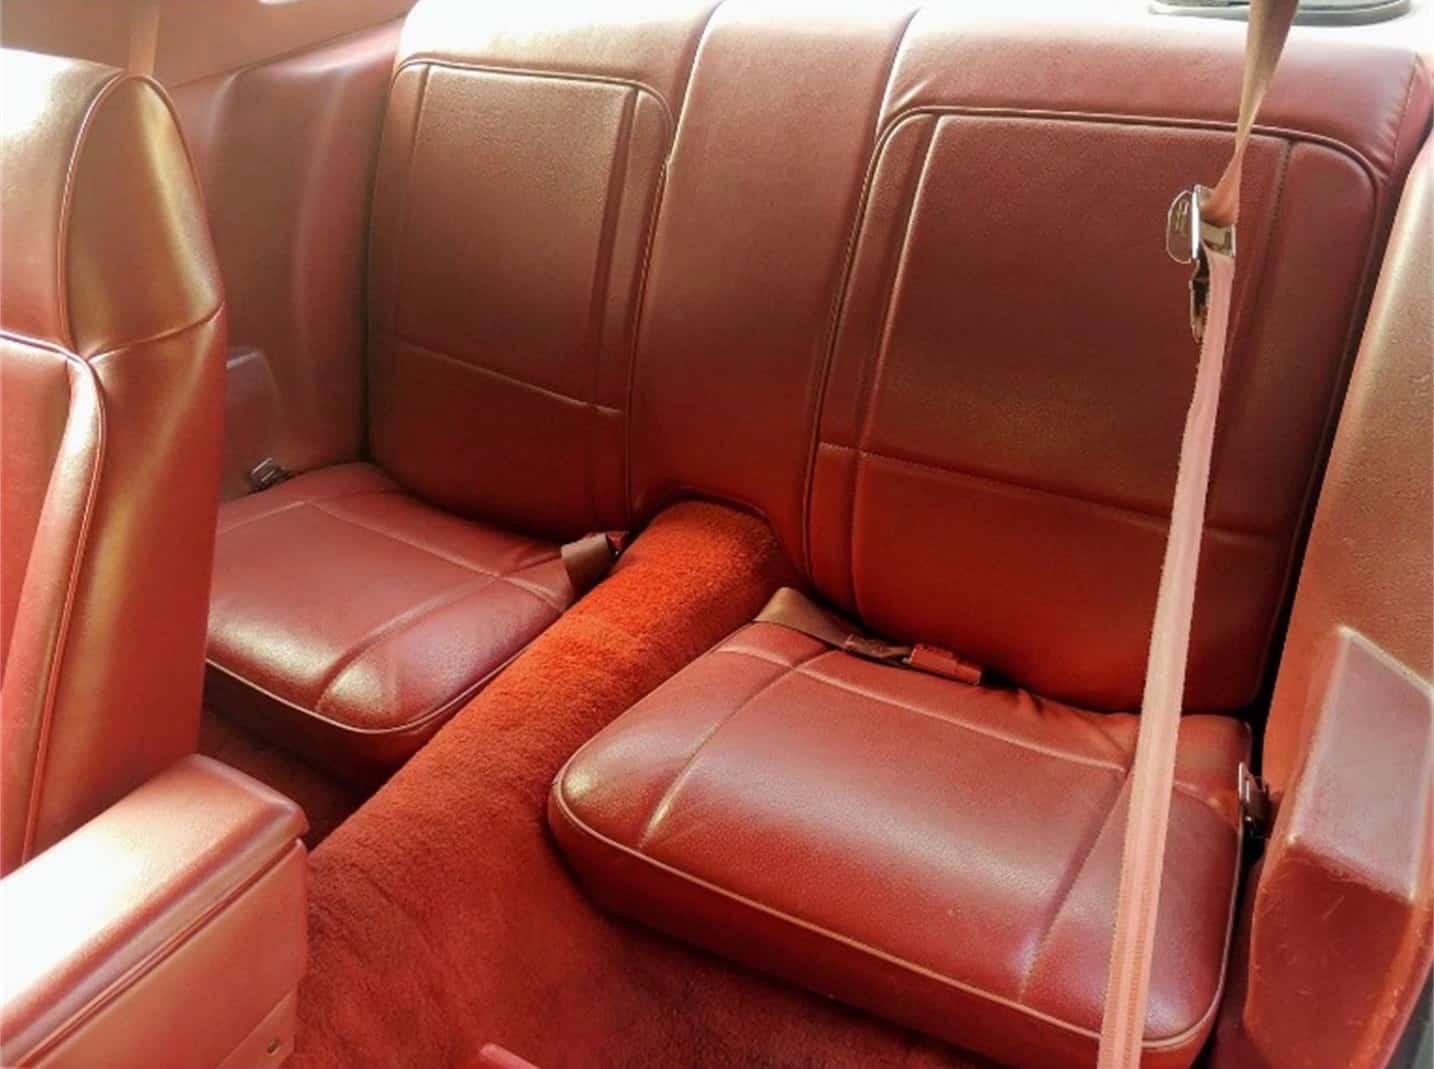 1980 Chevrolet Camaro Z28, Color scheme draws attention to this Camaro, ClassicCars.com Journal